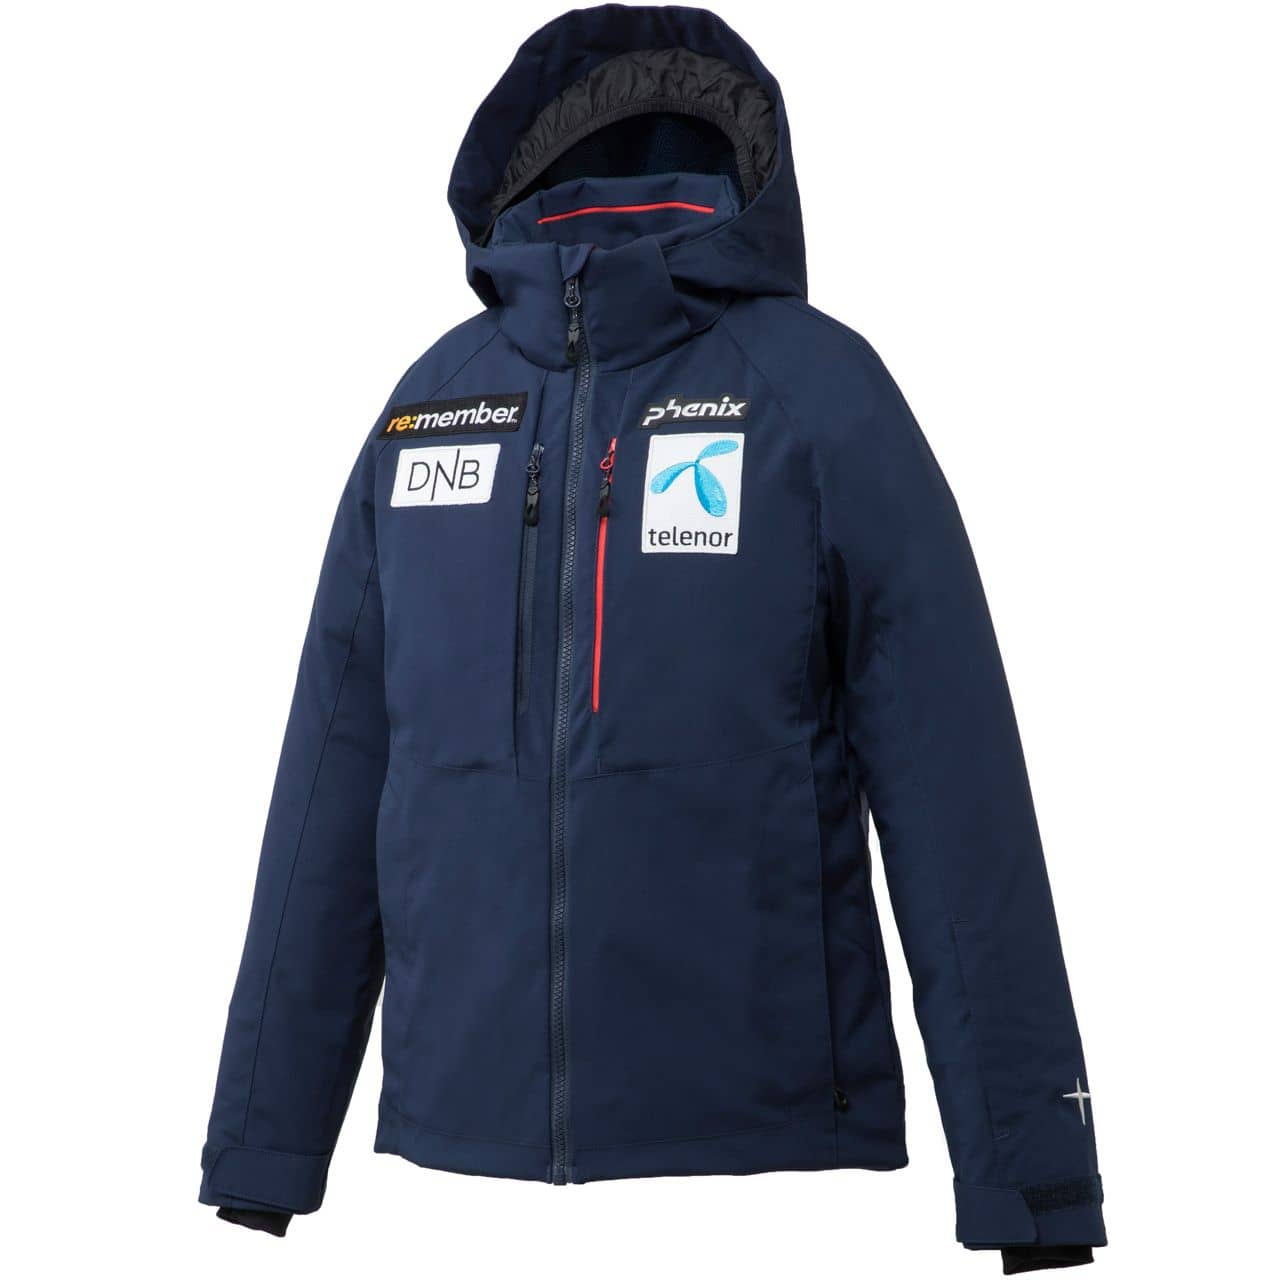 Phenix Junior Jacket Norway Alpine Team Replica...